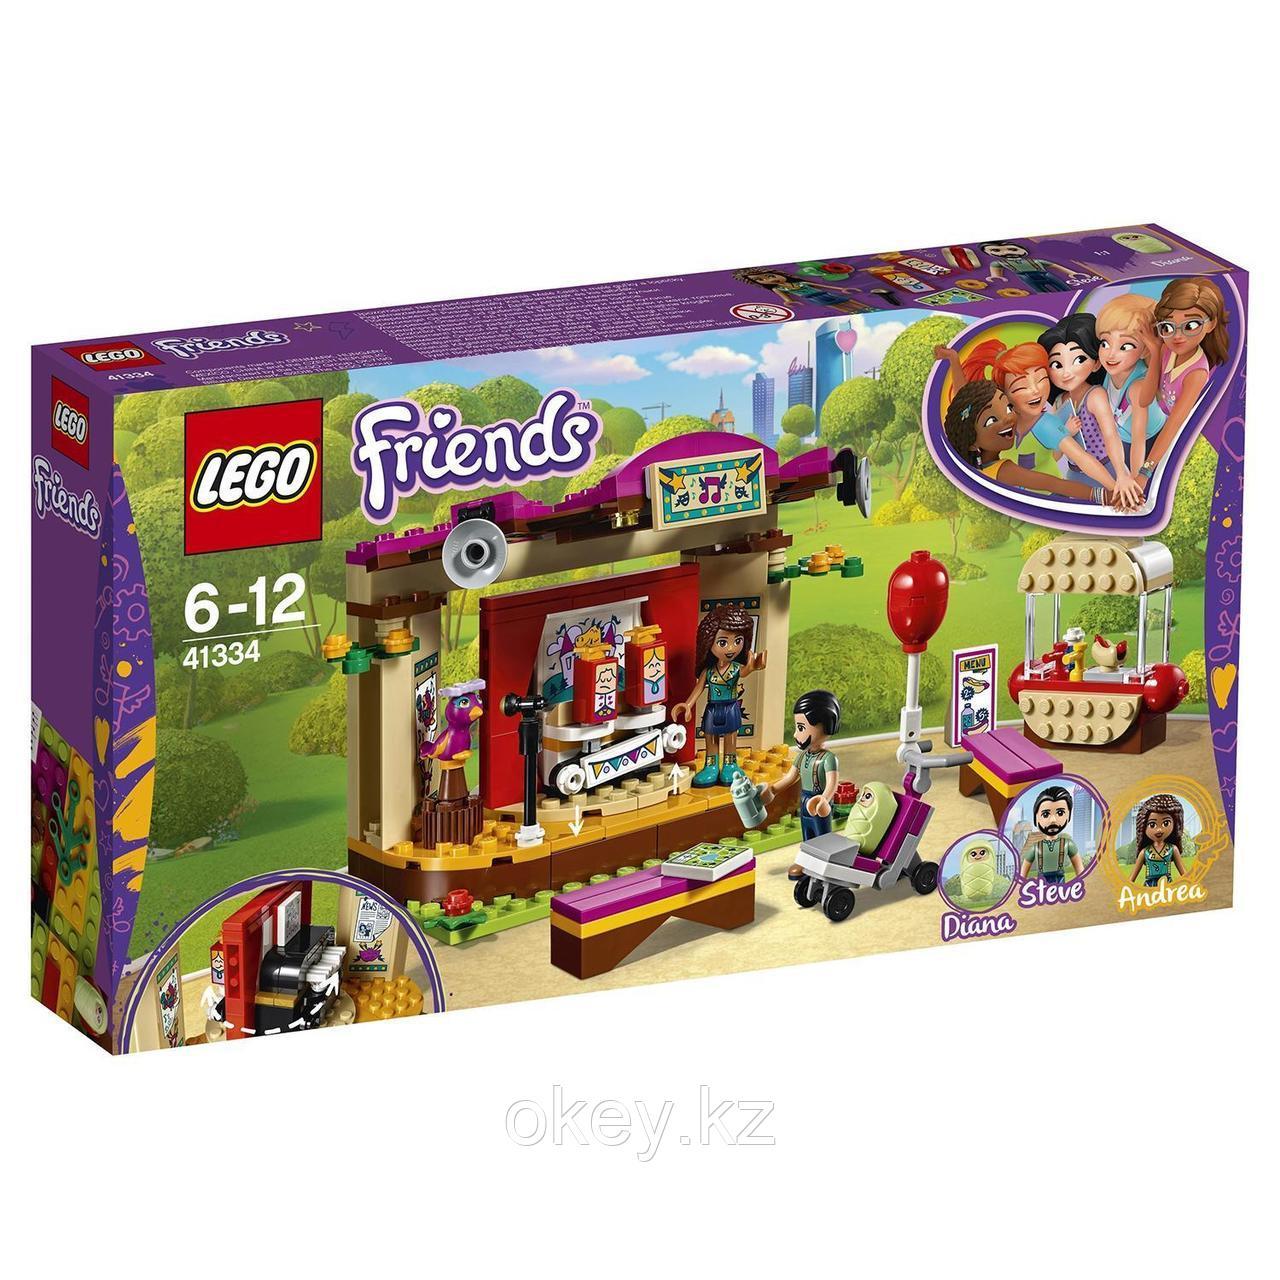 LEGO Friends: Сцена Андреа в парке 41334